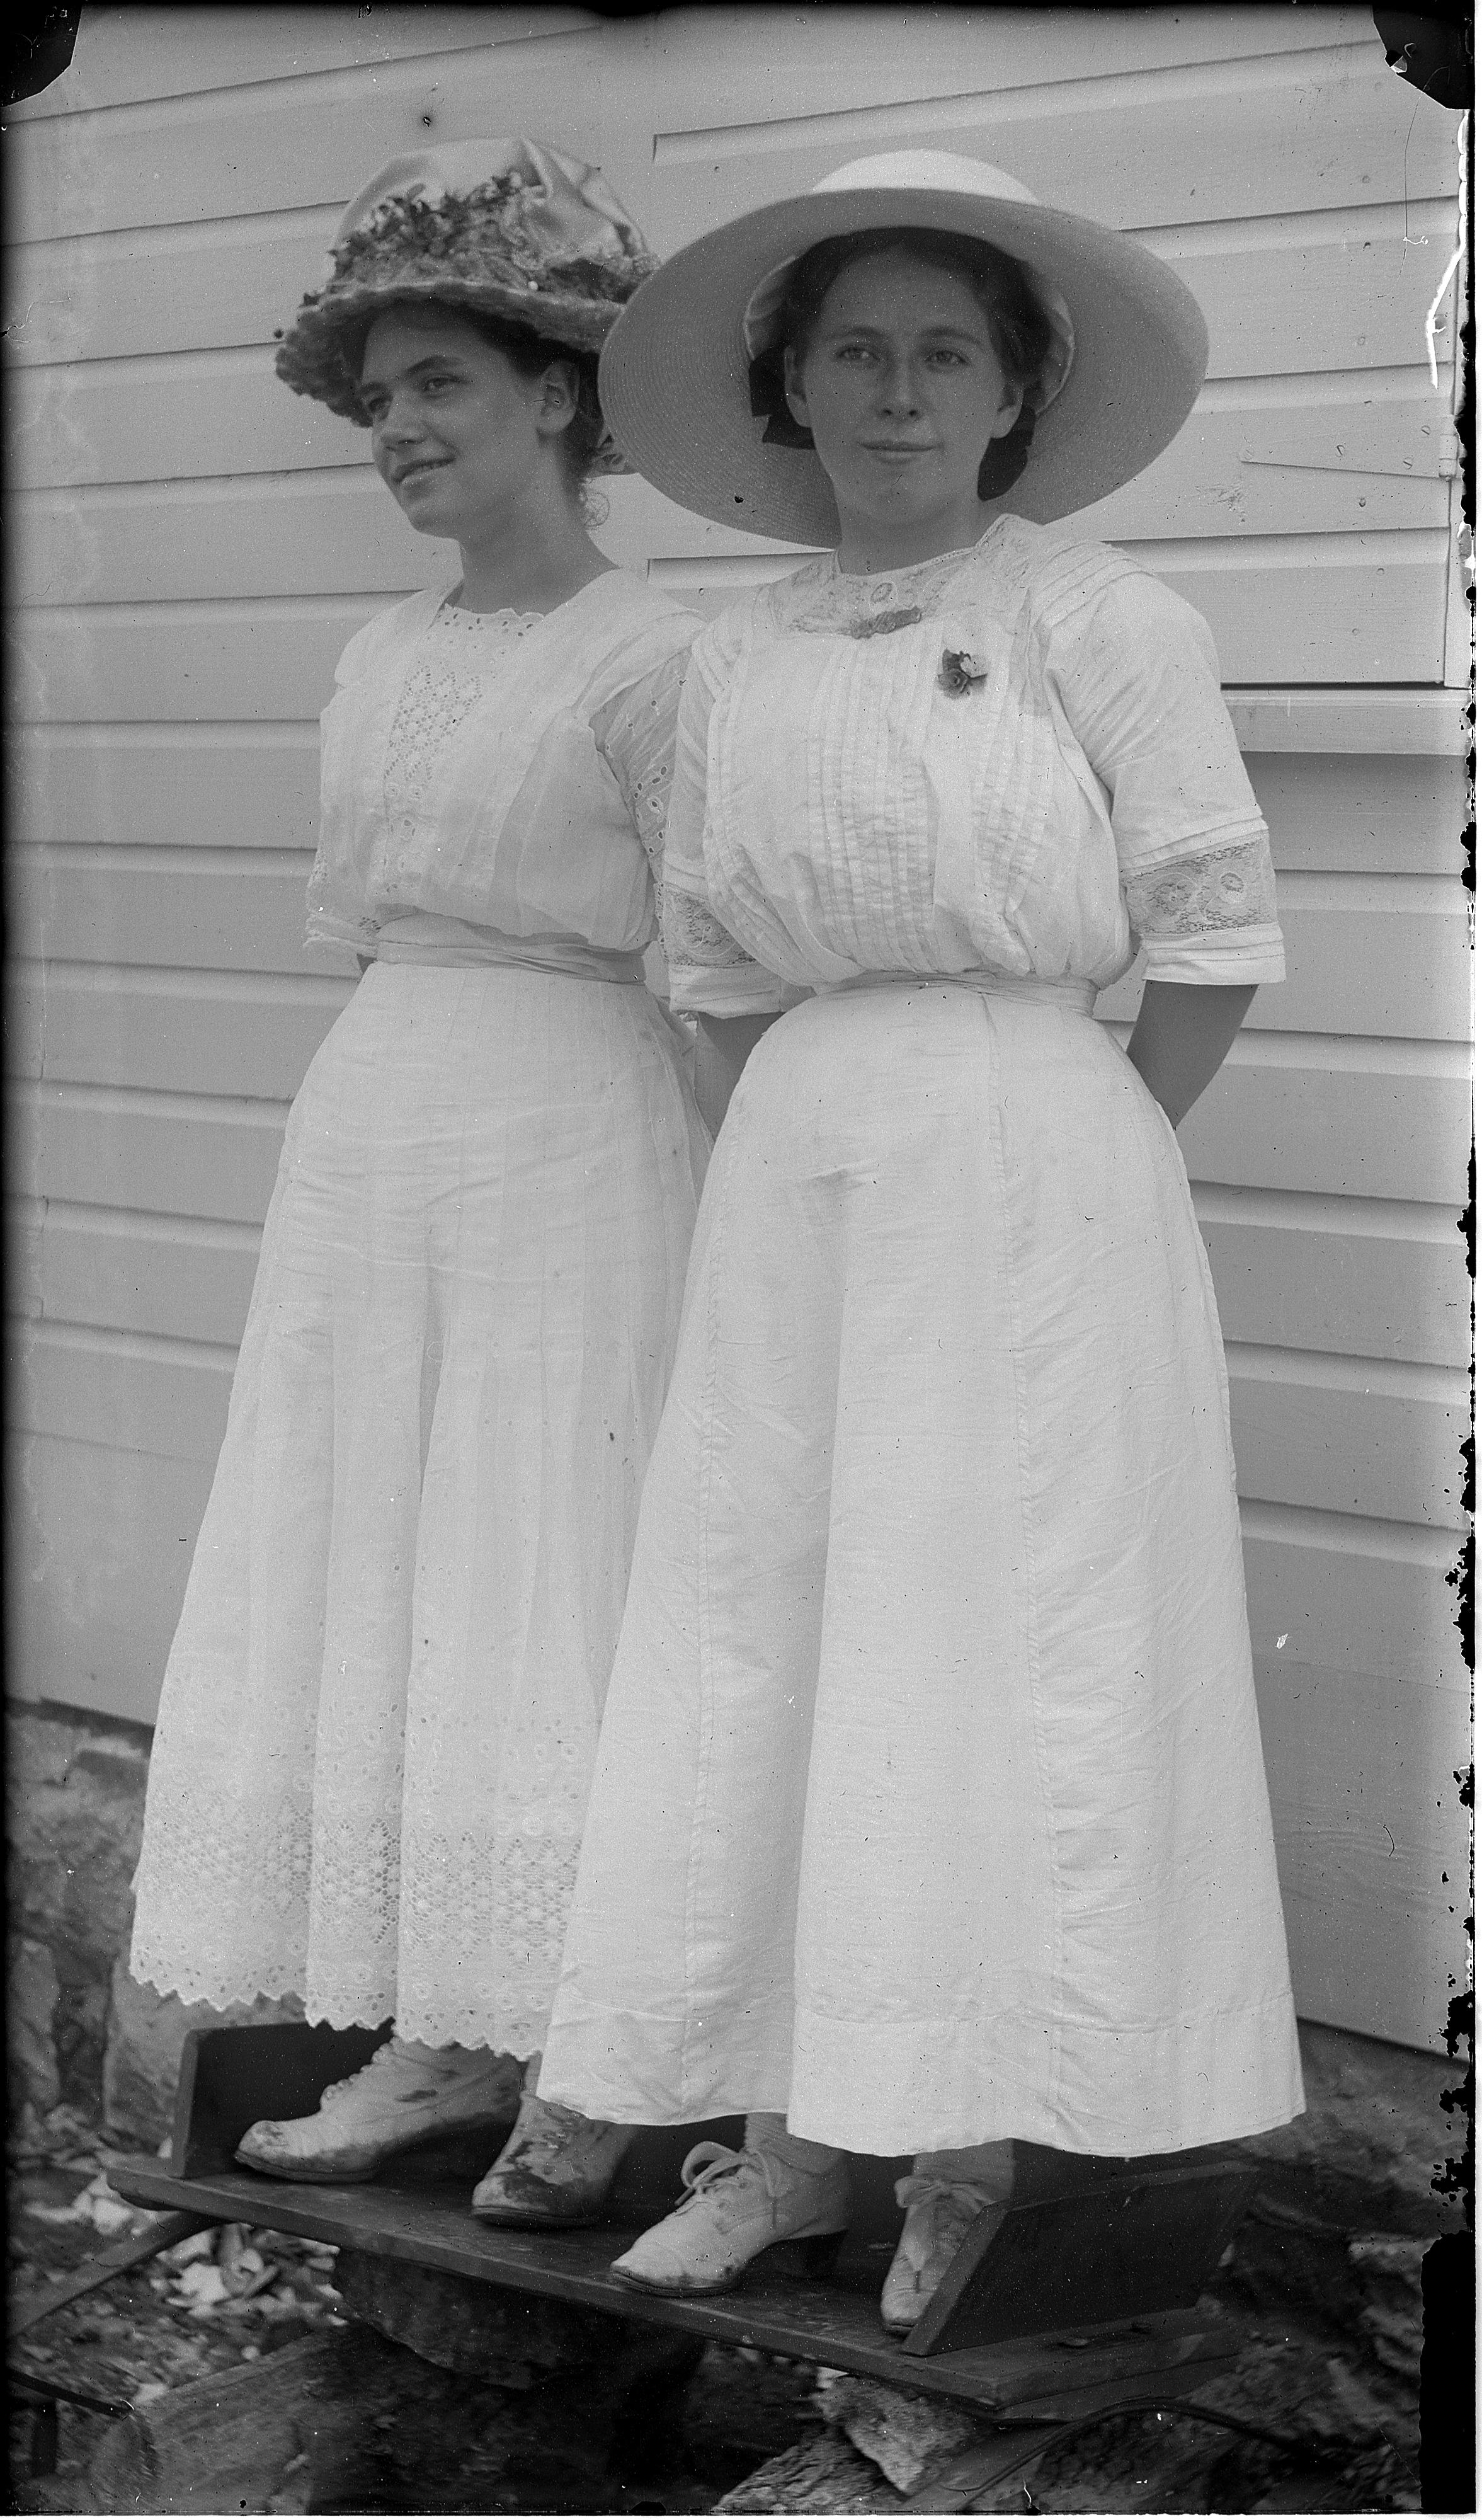 Historic Fashion - 1900s